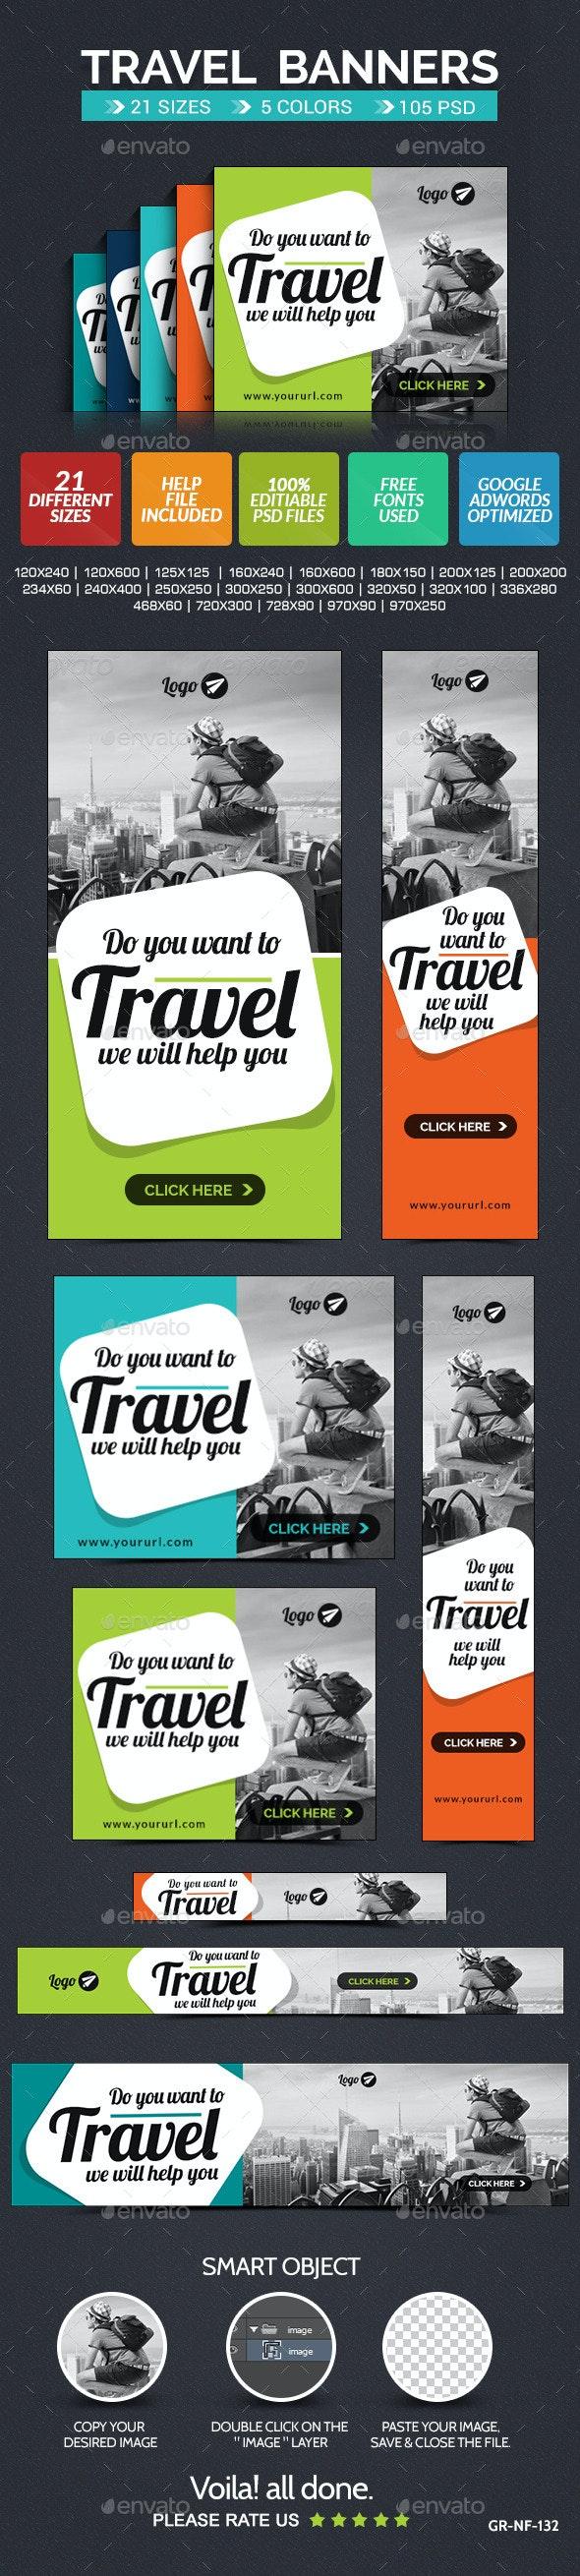 Travel Web Banner Set - 5 colors - Banners & Ads Web Elements